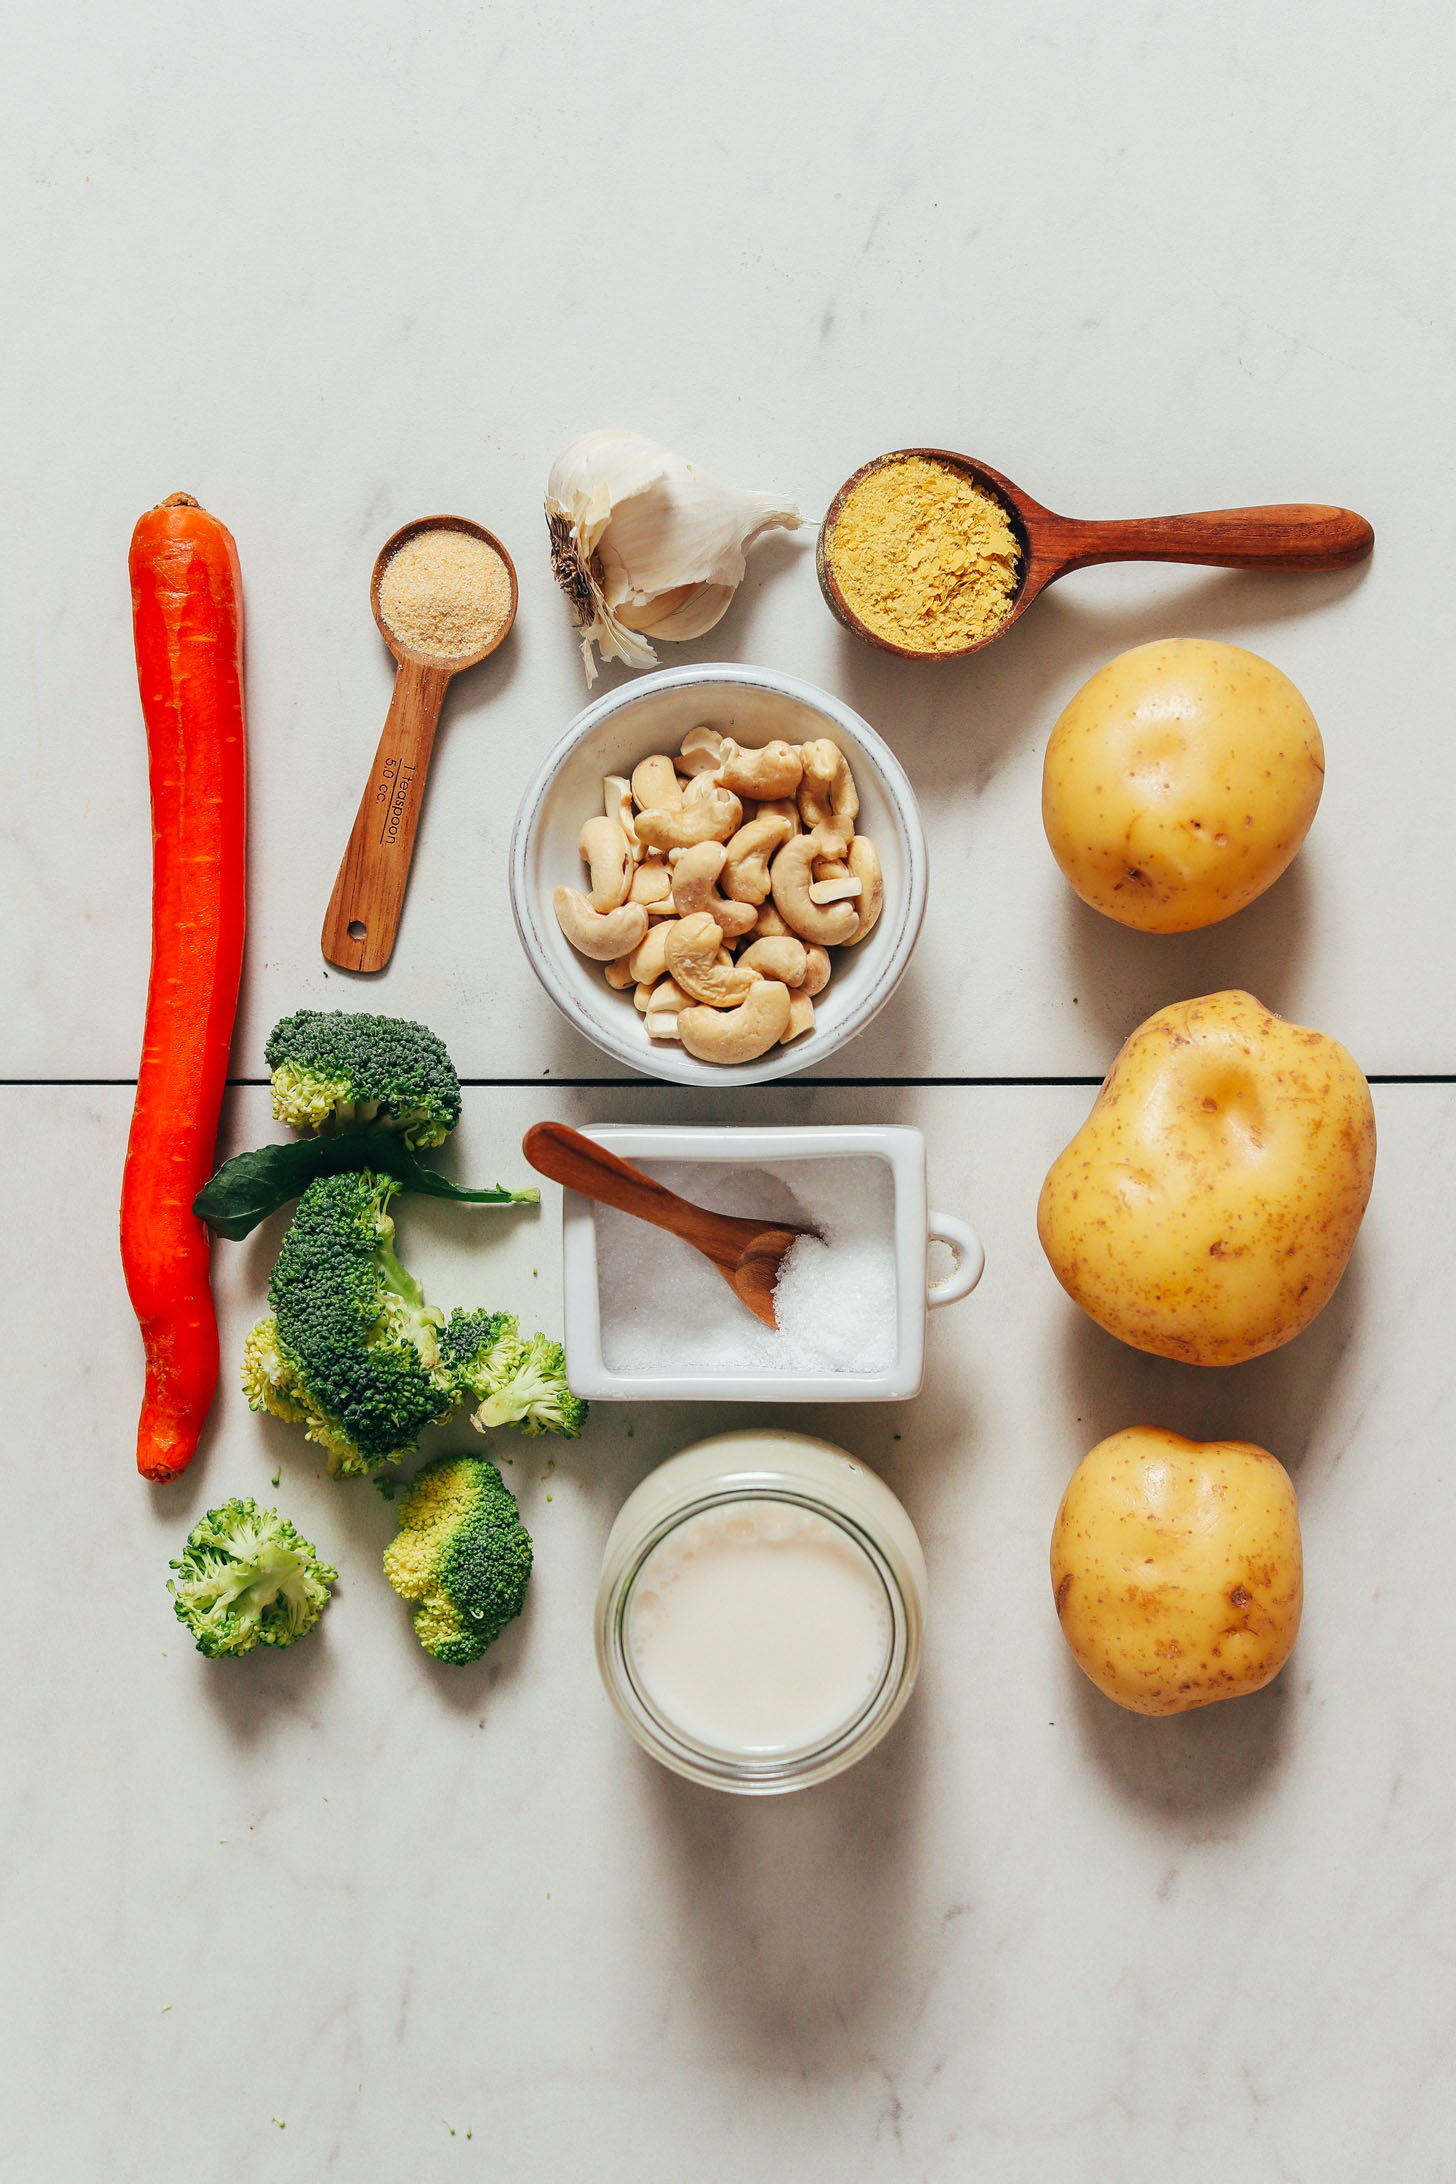 Carrot, broccoli, dairy-free milk, salt, cashews, garlic powder, garlic, nutritional yeast, and gold potatoes